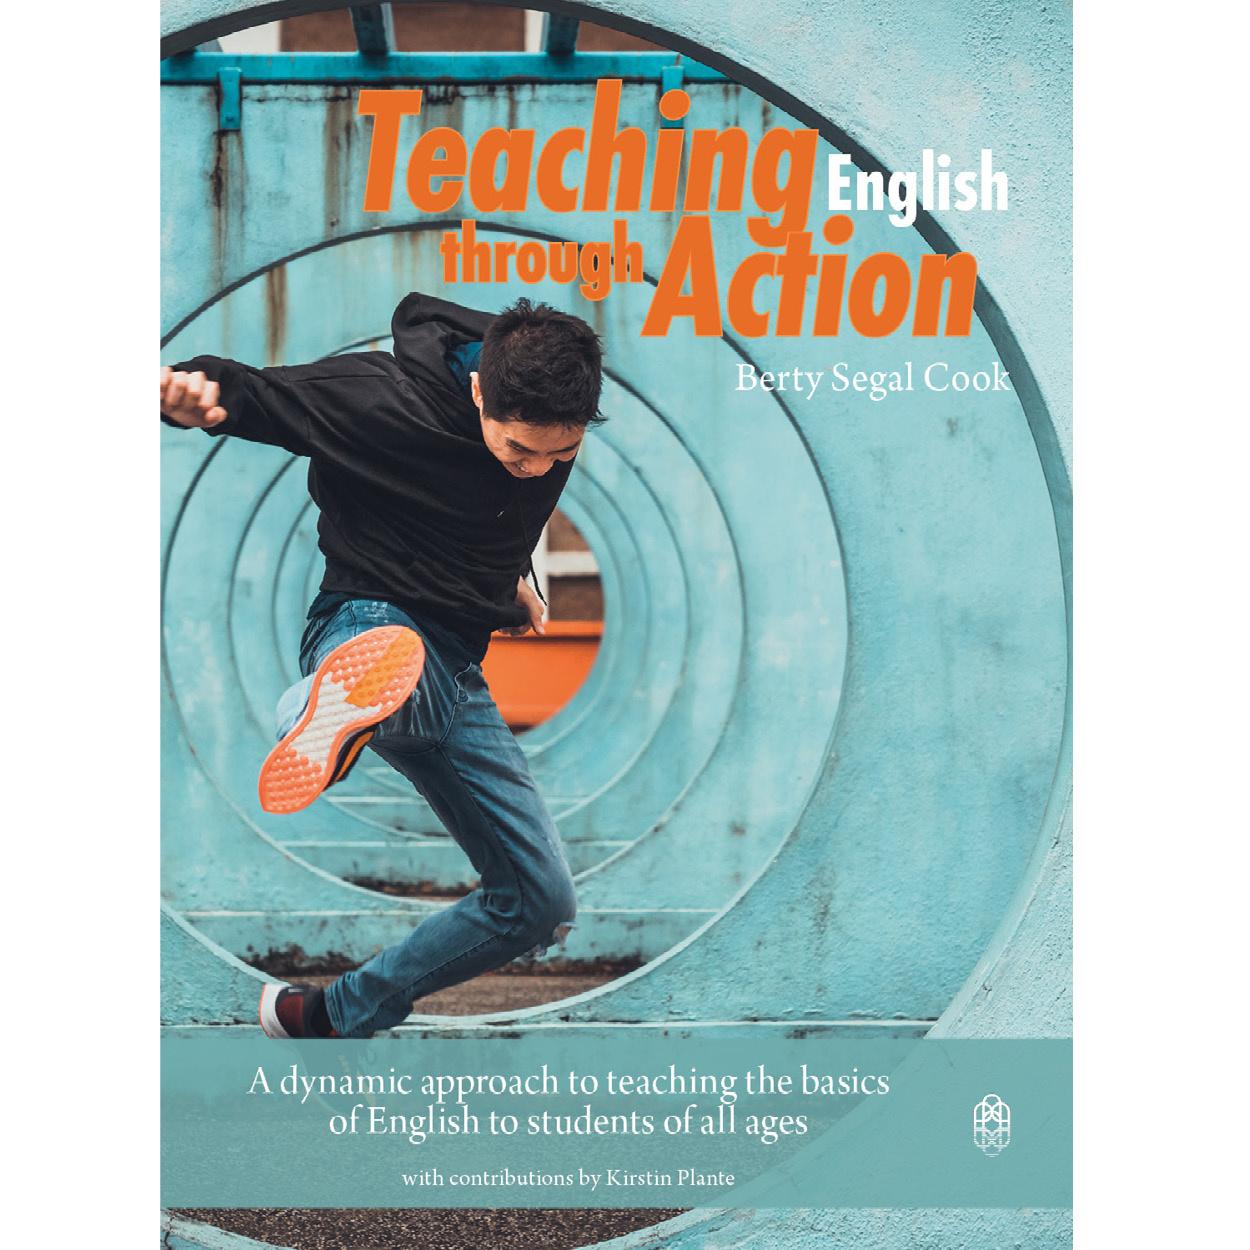 Teaching English through Action